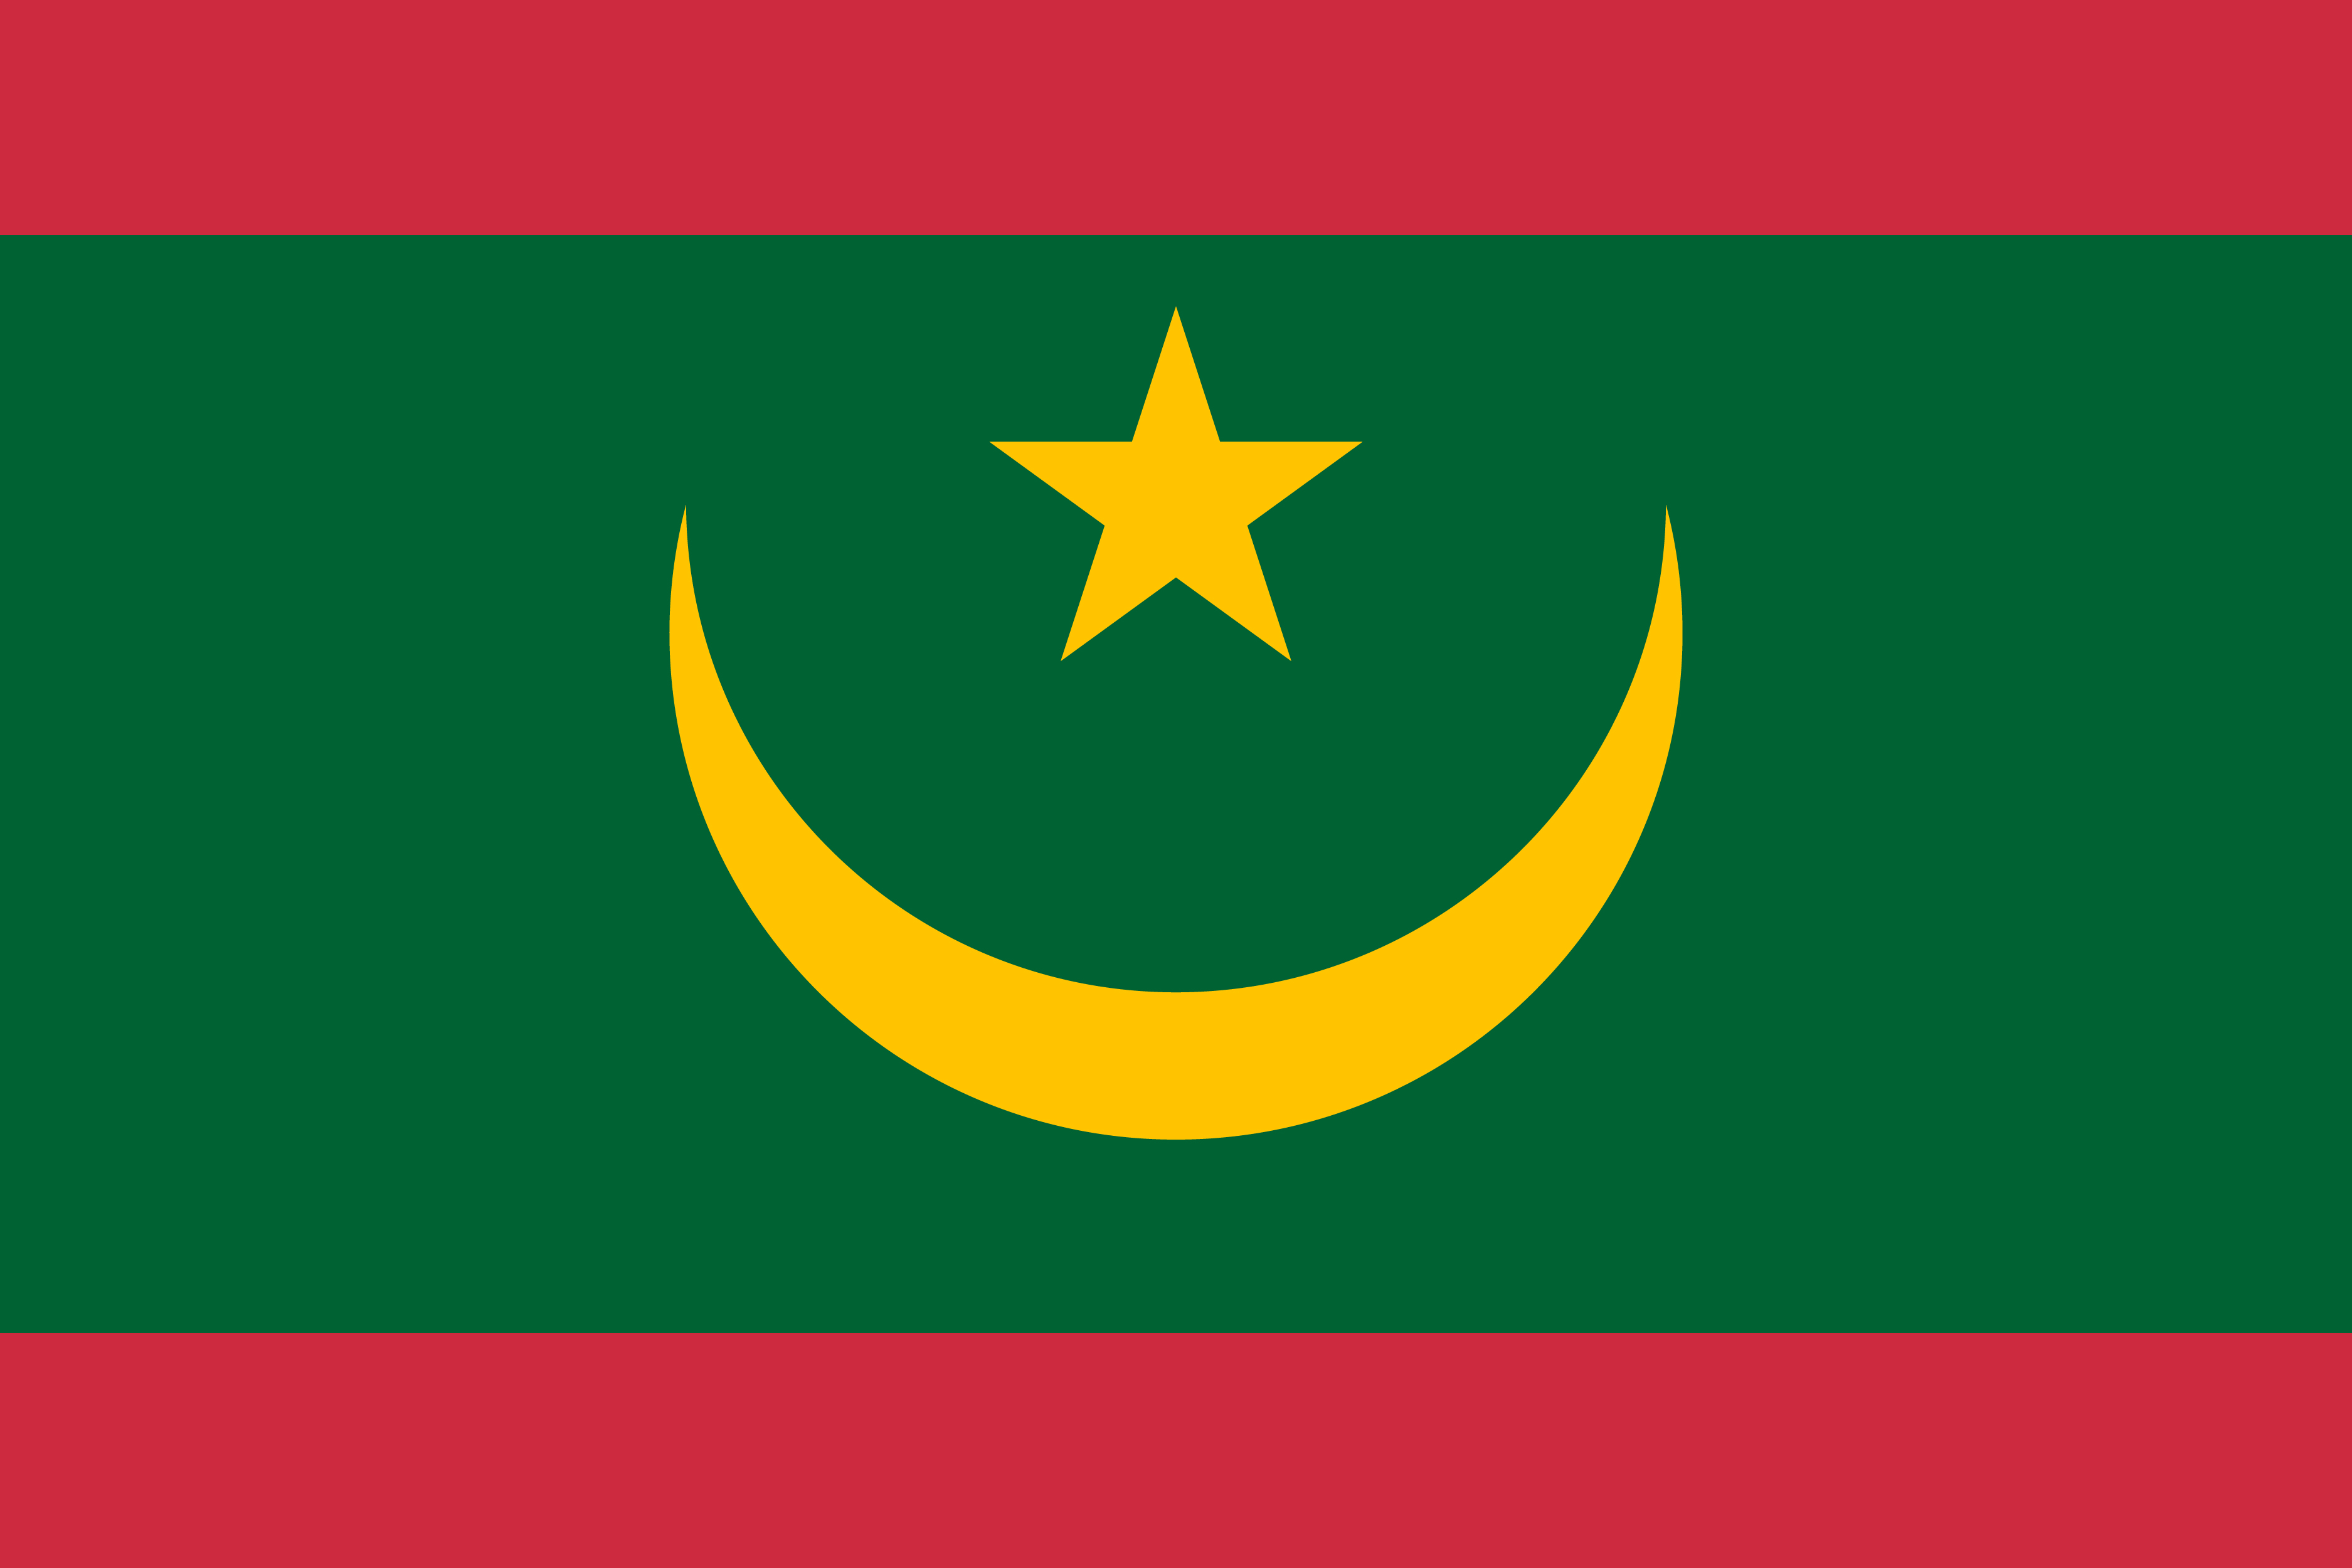 Bandiera Adesiva Mauritania